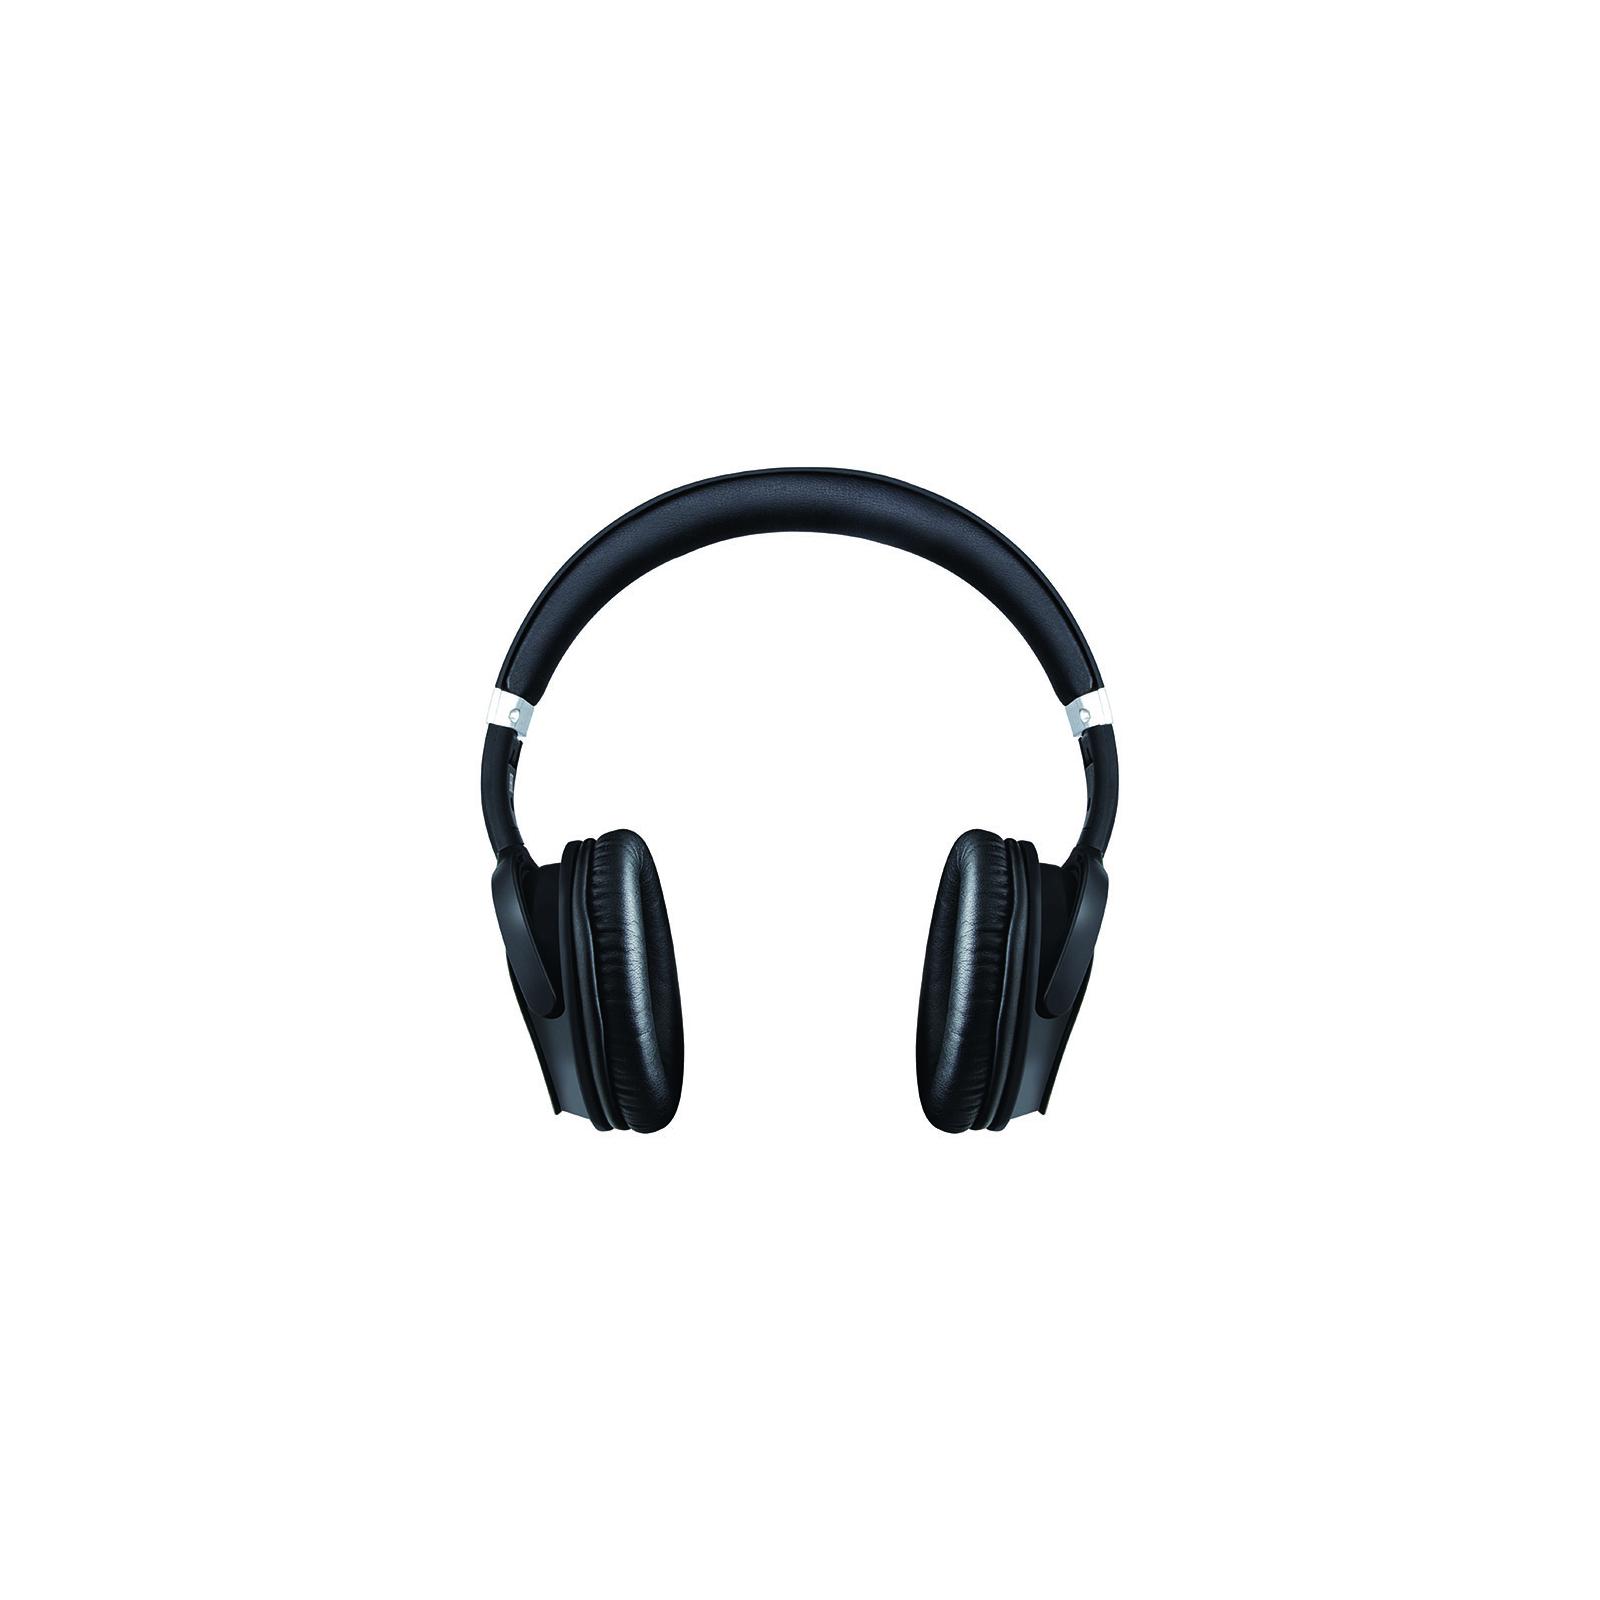 Наушники Sven AP-B900MV Black Bluetooth (AP-B900MV black) изображение 2